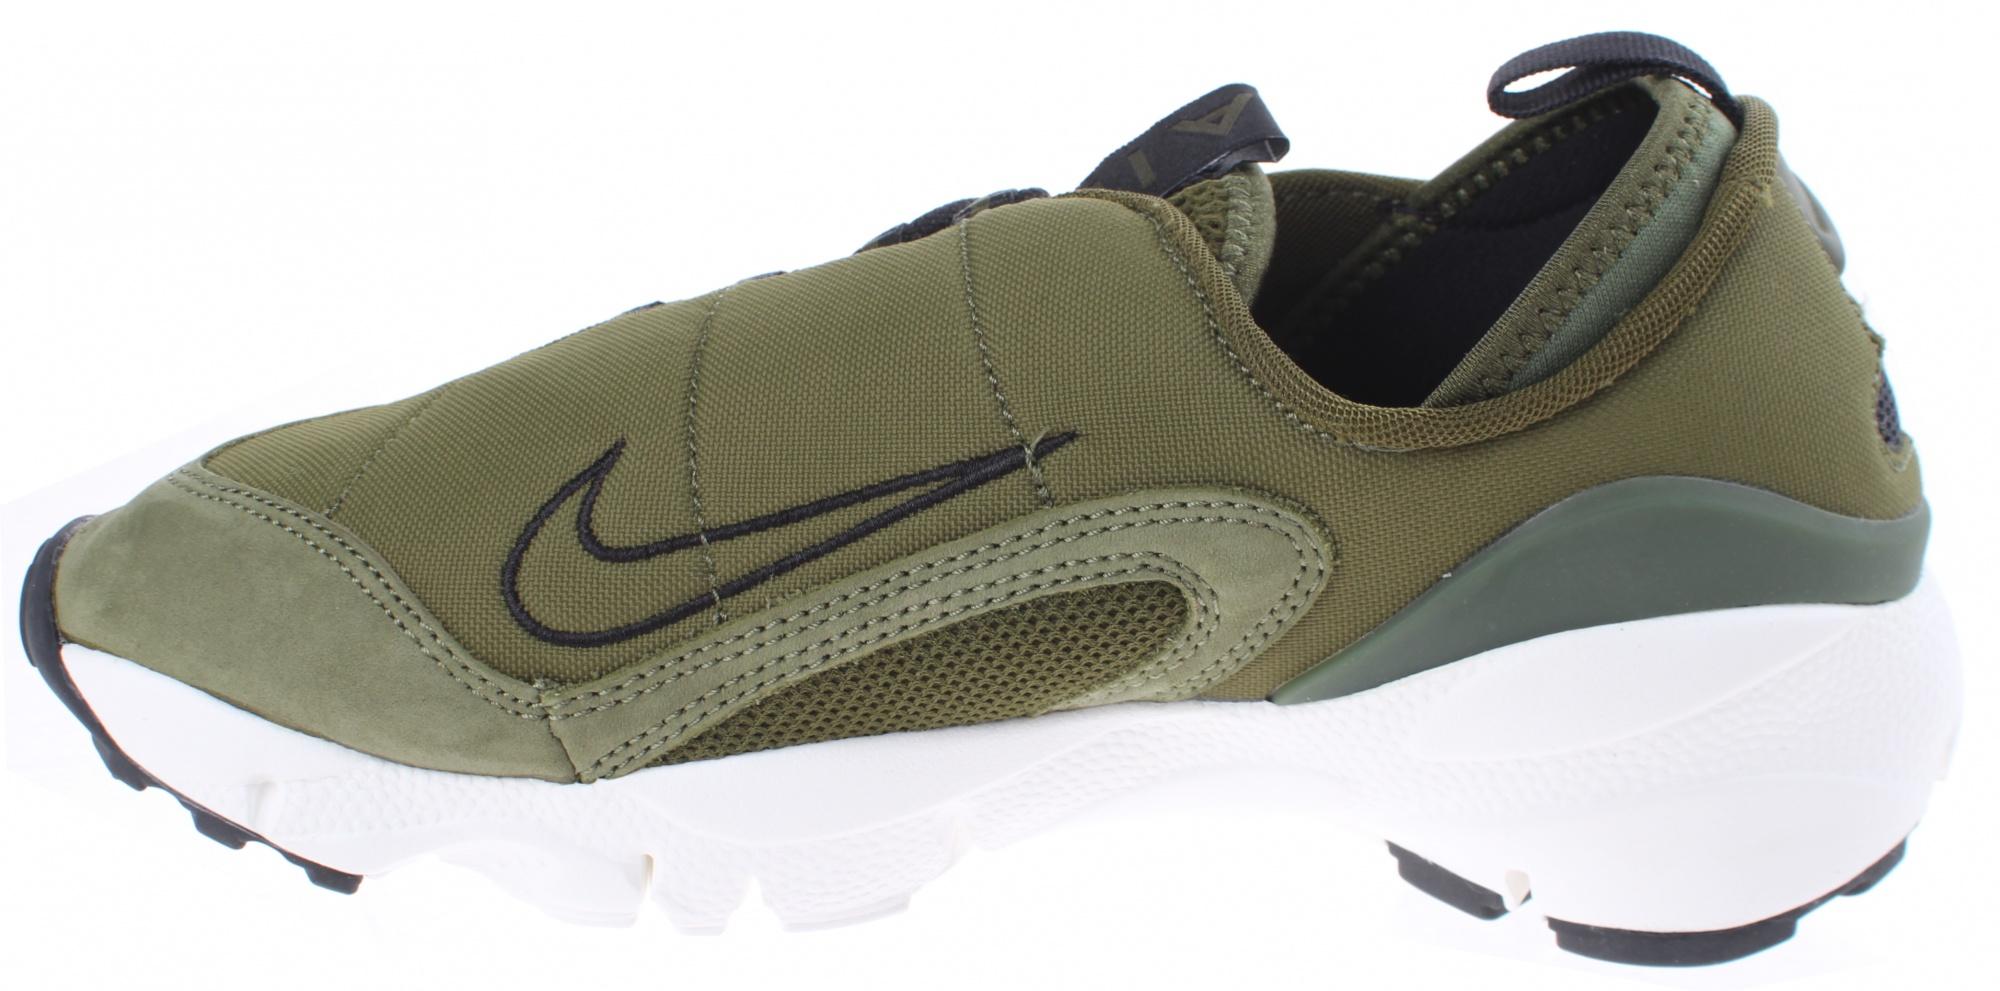 cheaper ce474 13413 ... Nike sneakers Air Footscape NM heren groen ...